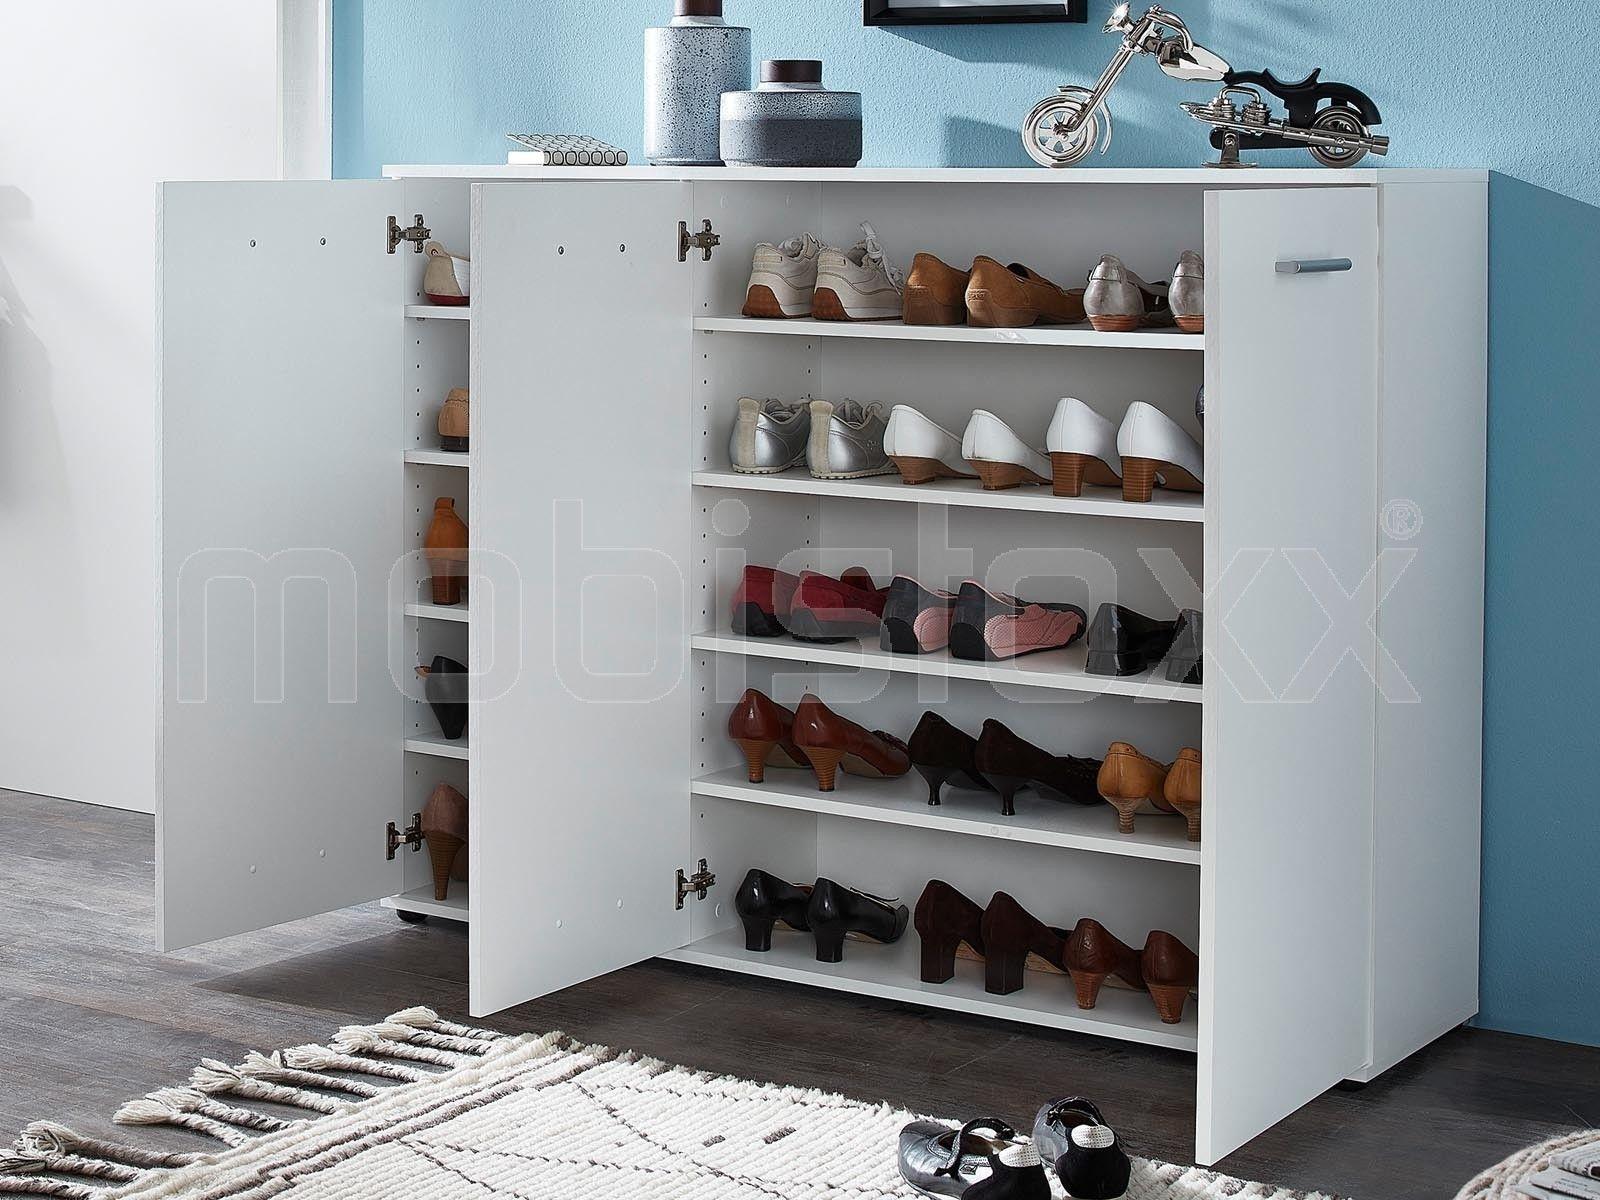 Armoire A Chaussures Bombyx 3 Portes Blanc Chez Mobistoxx Placard Chaussure Meuble Chaussure Armoire Chaussures